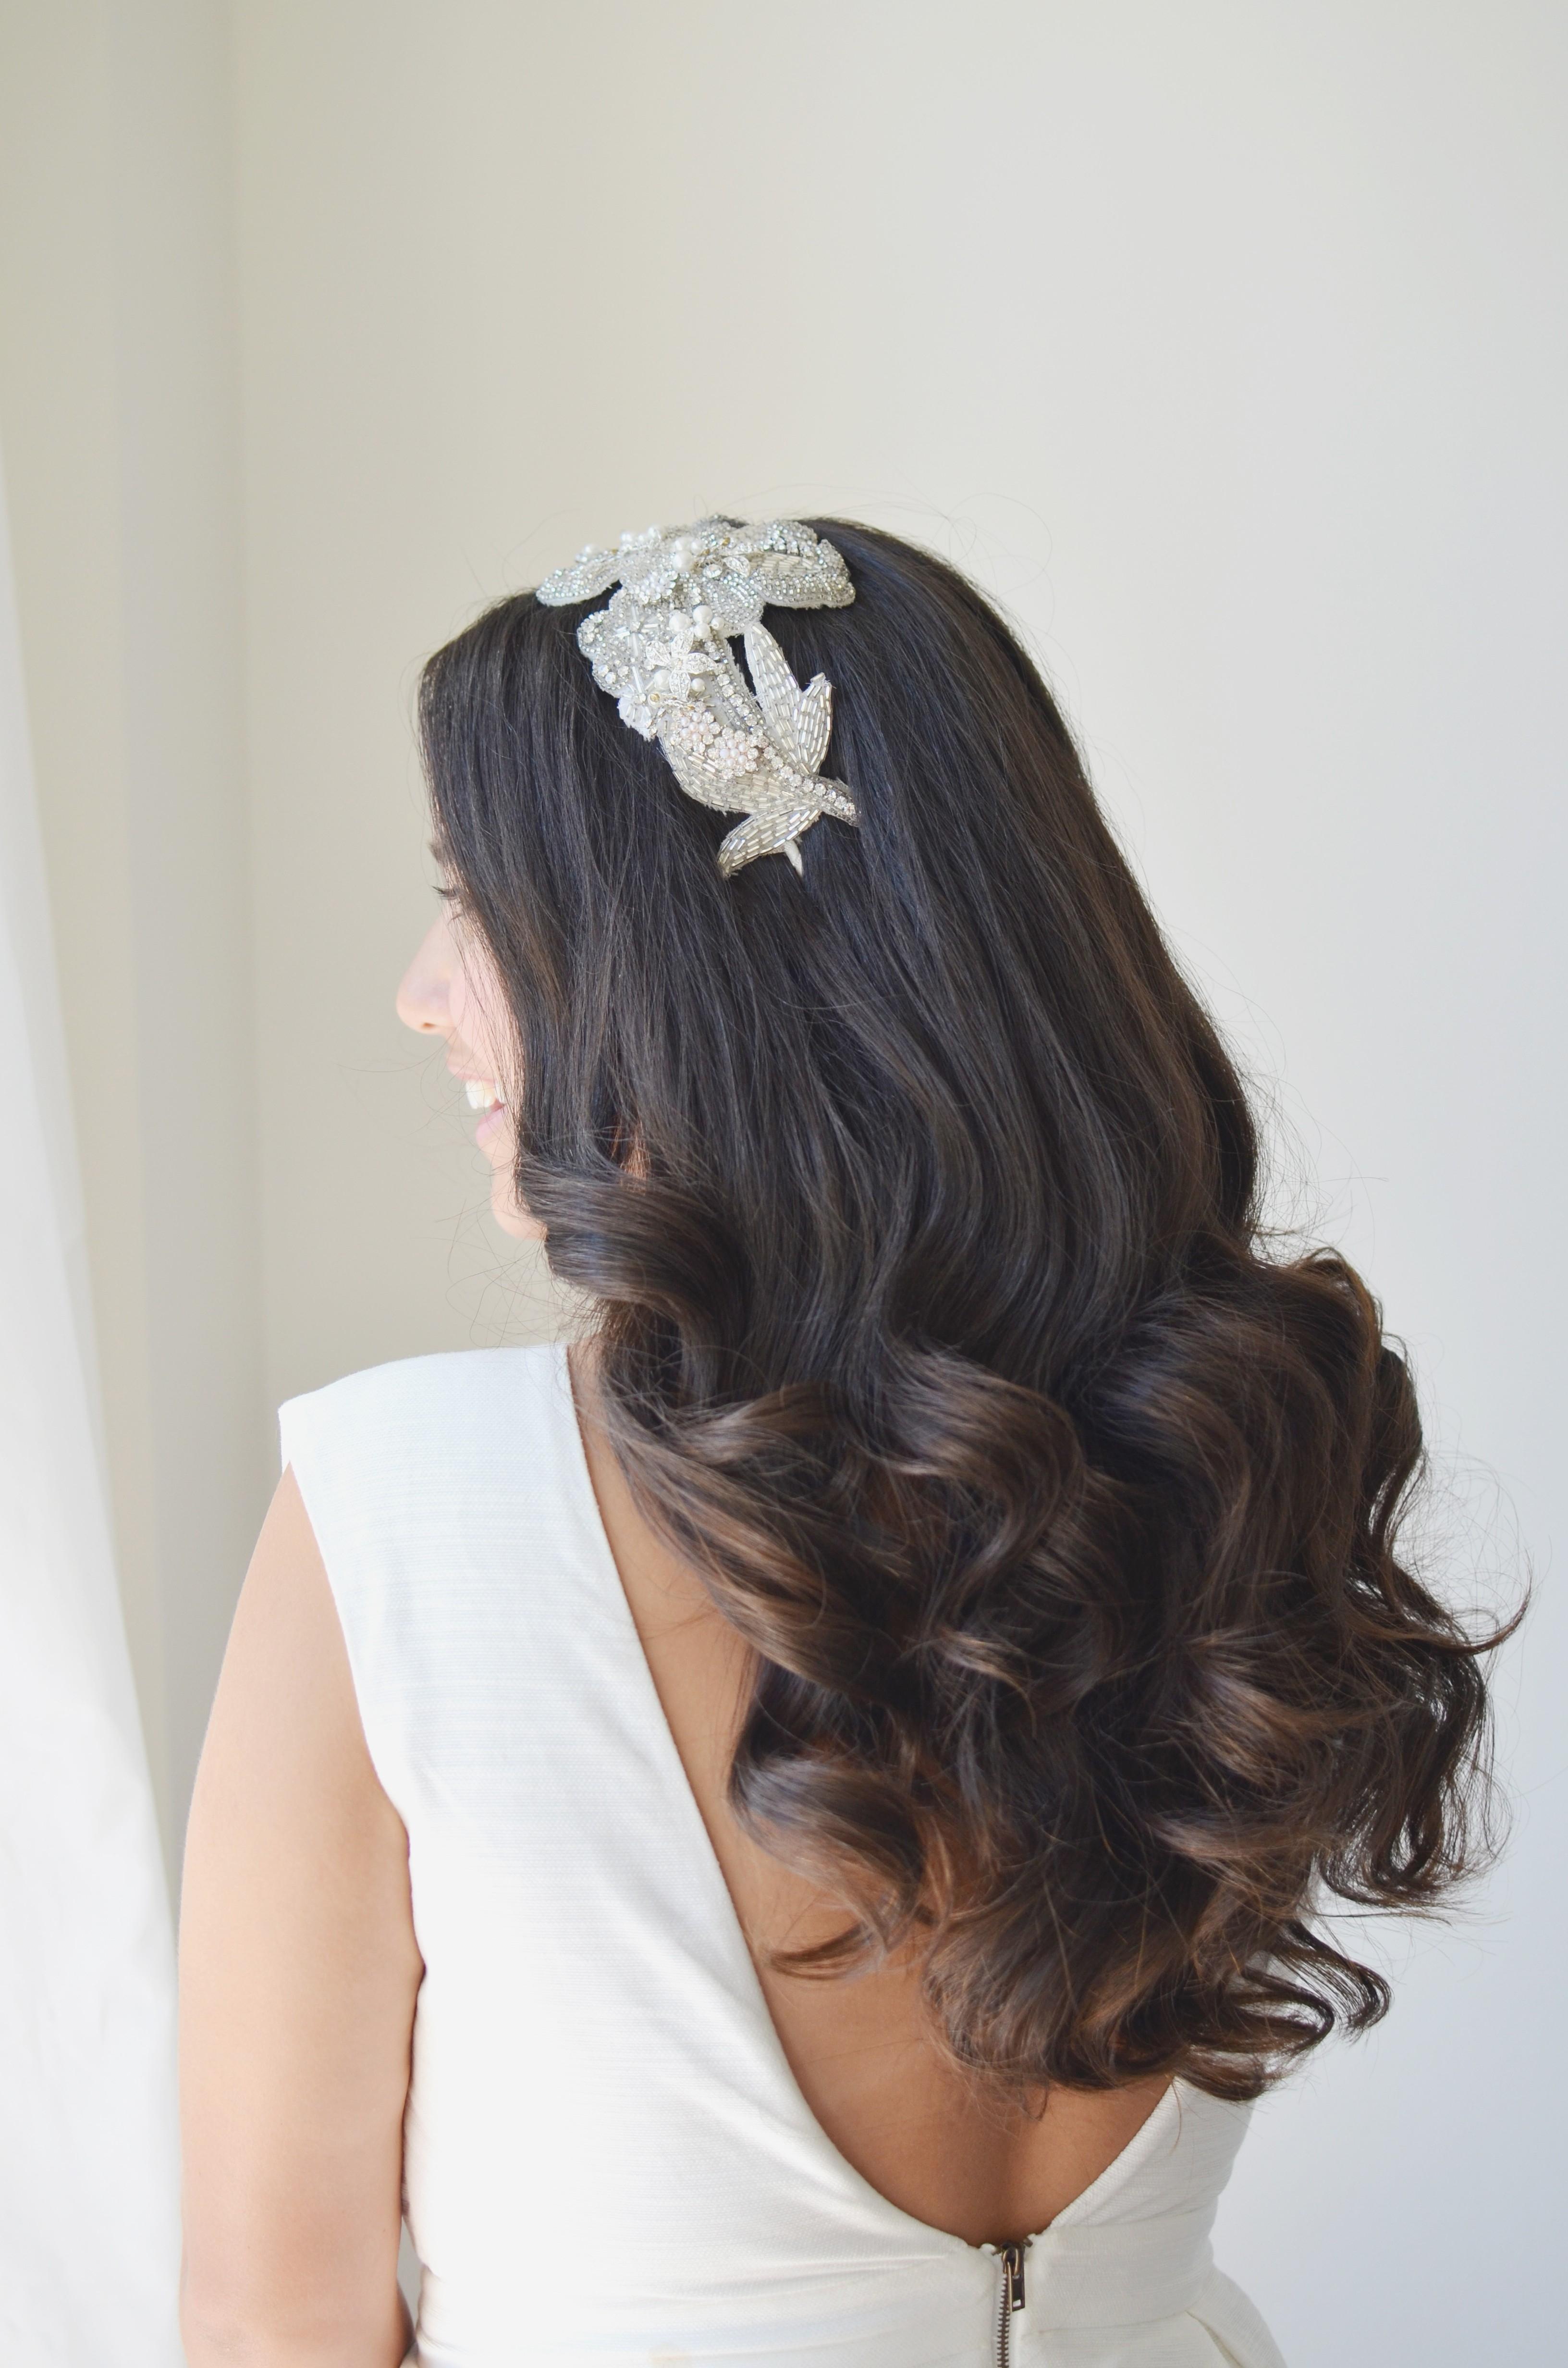 Wedding Hairstyles : Fresh Brunette Wedding Hairstyles For A Round With Regard To 2017 Brunette Wedding Hairstyles (View 13 of 15)